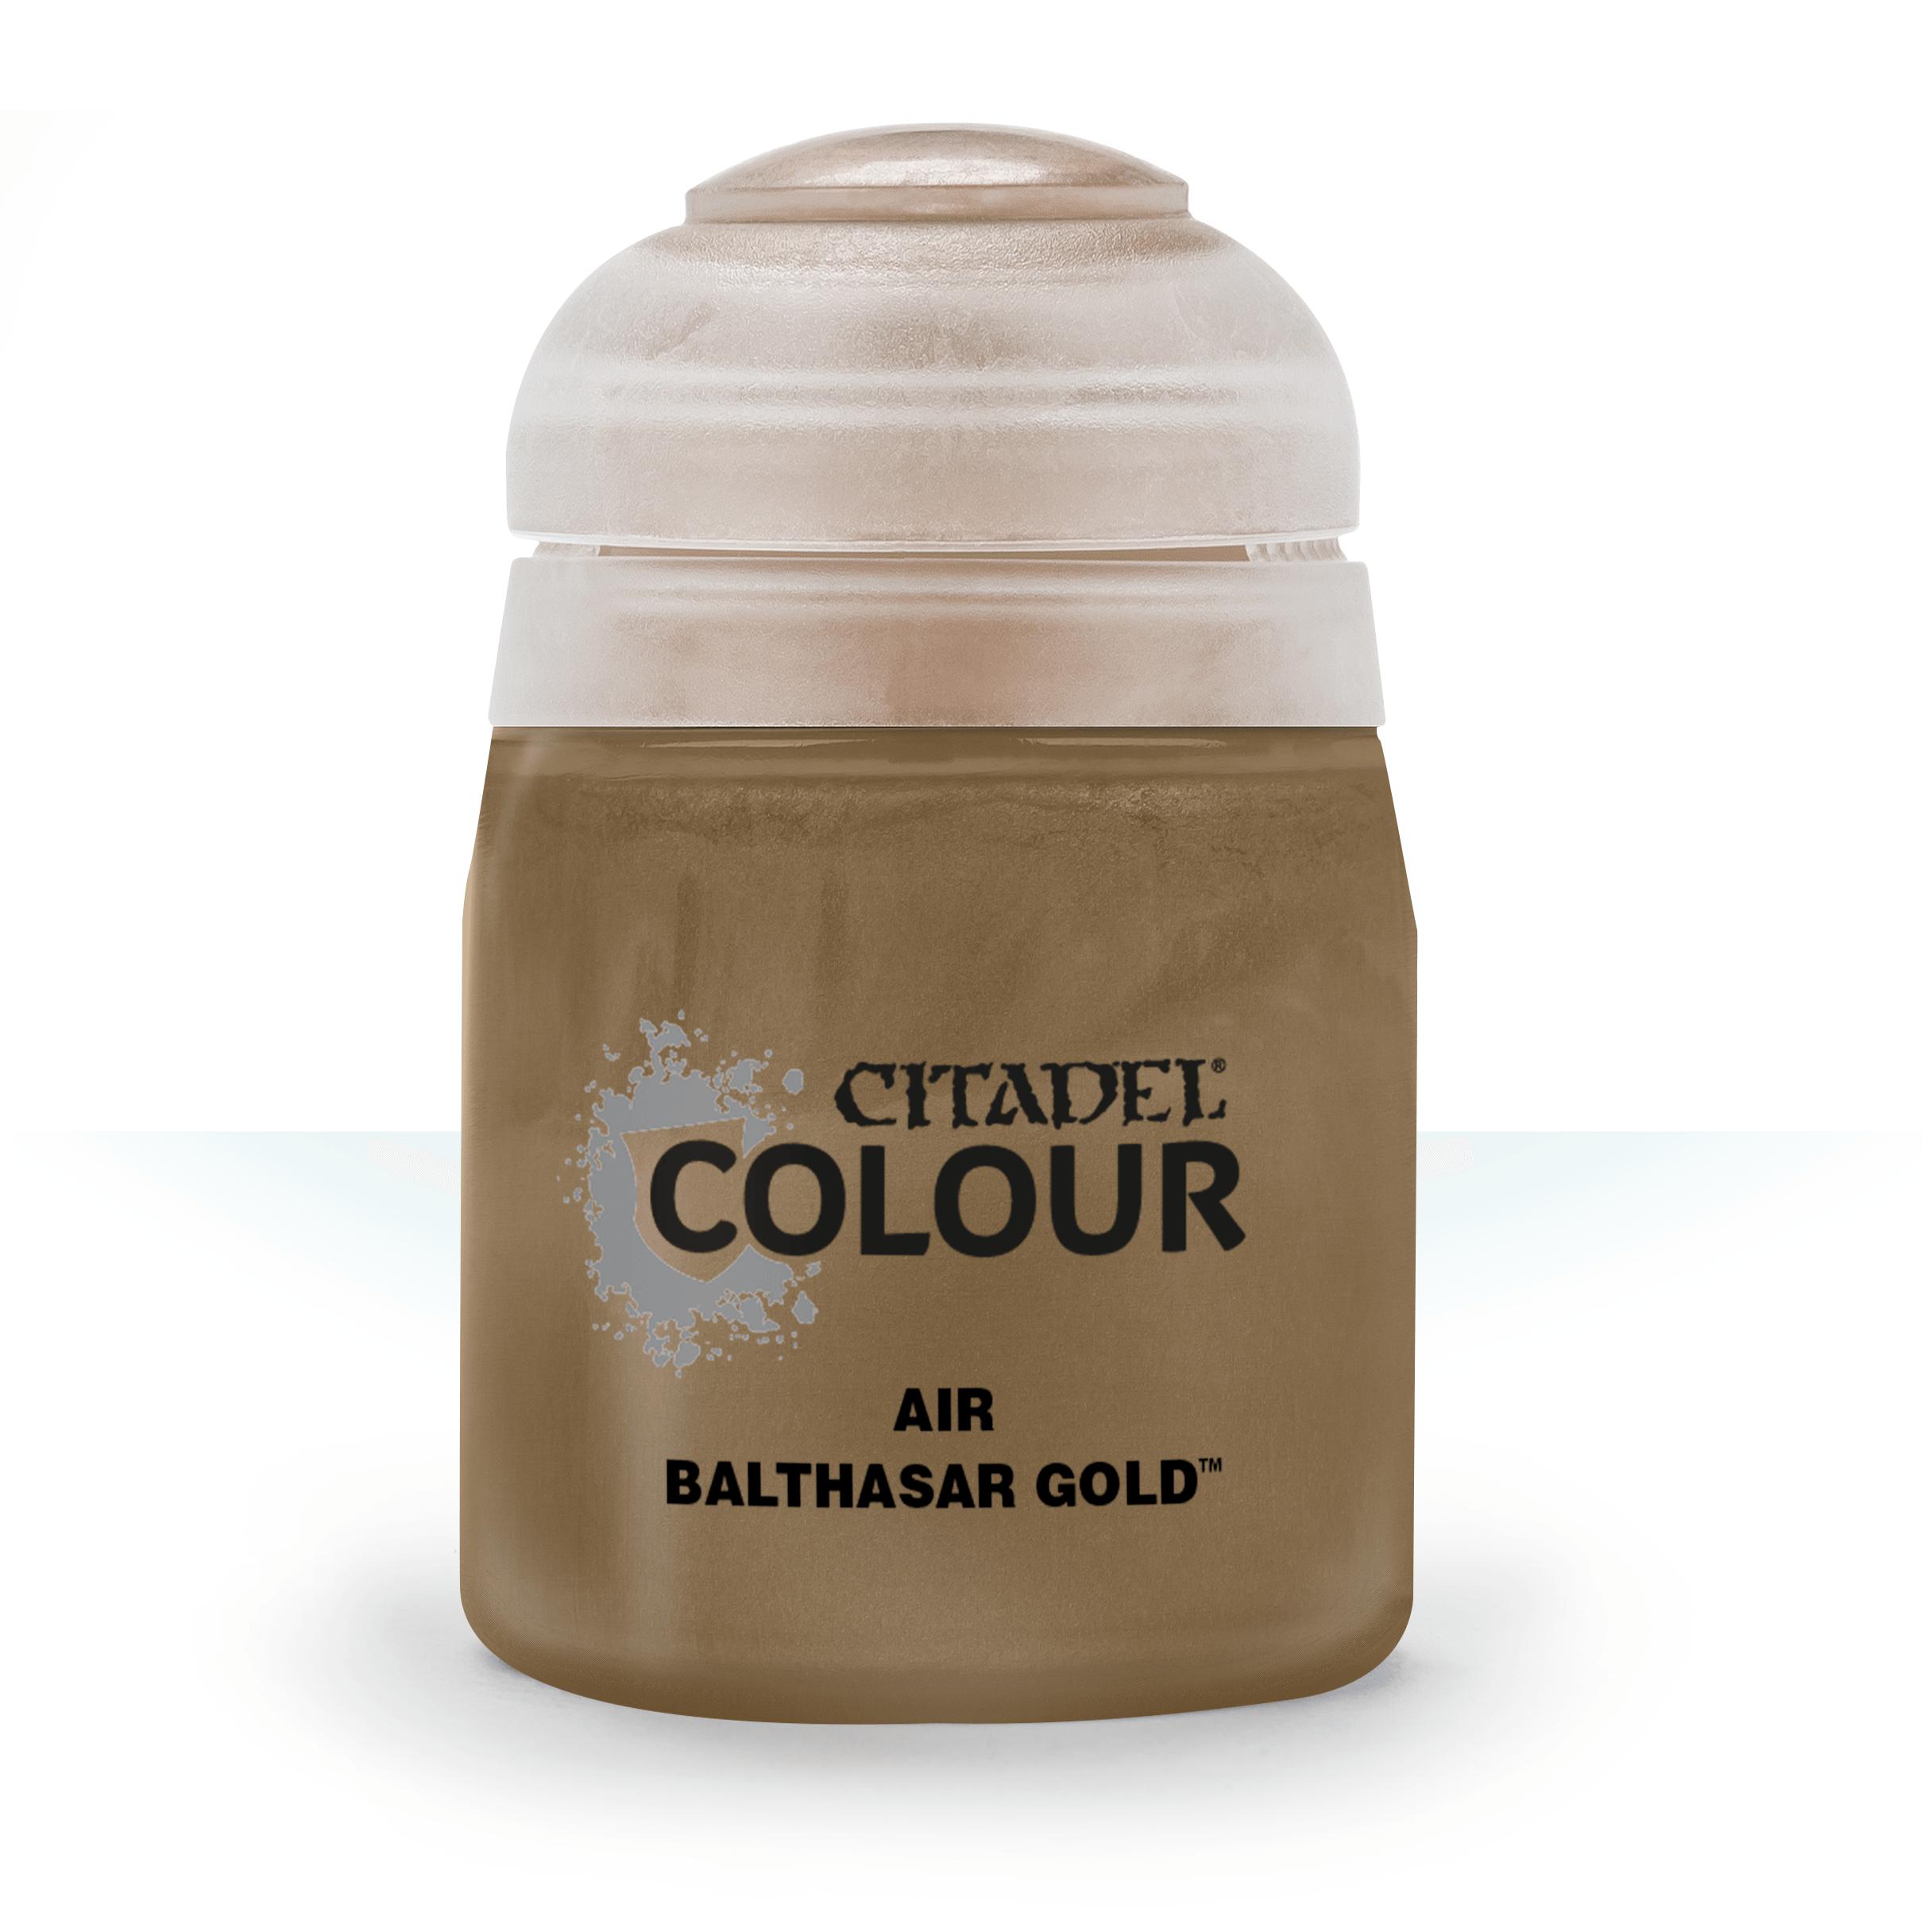 Balthasar Gold, Citadel Air 24ml